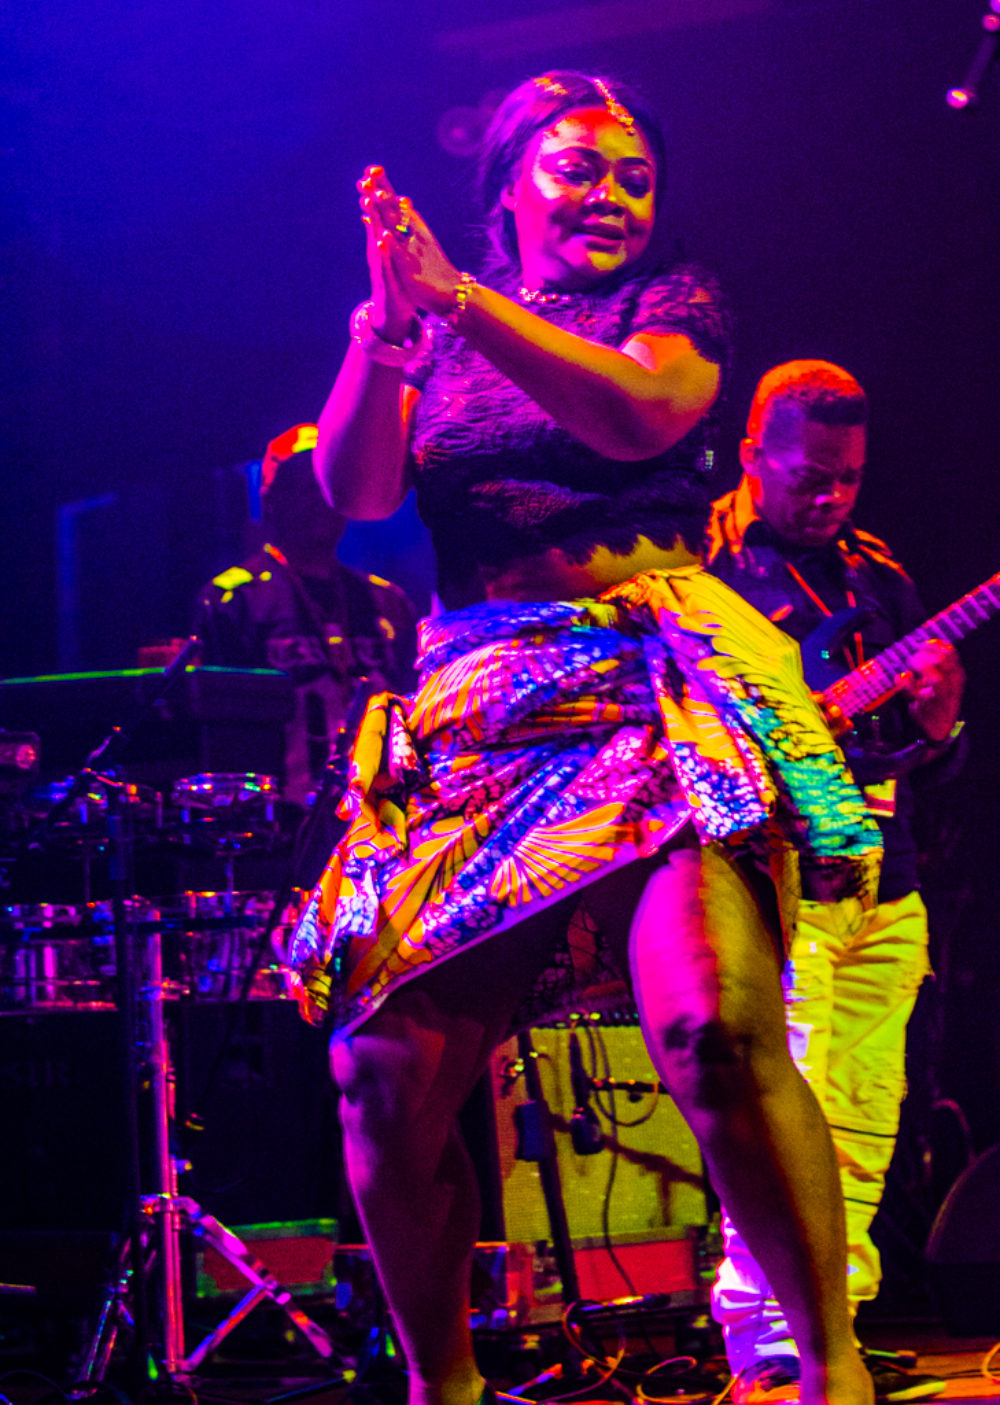 Blandine and guitarist Huit Kilos, Afrisa (Eyre 2017)